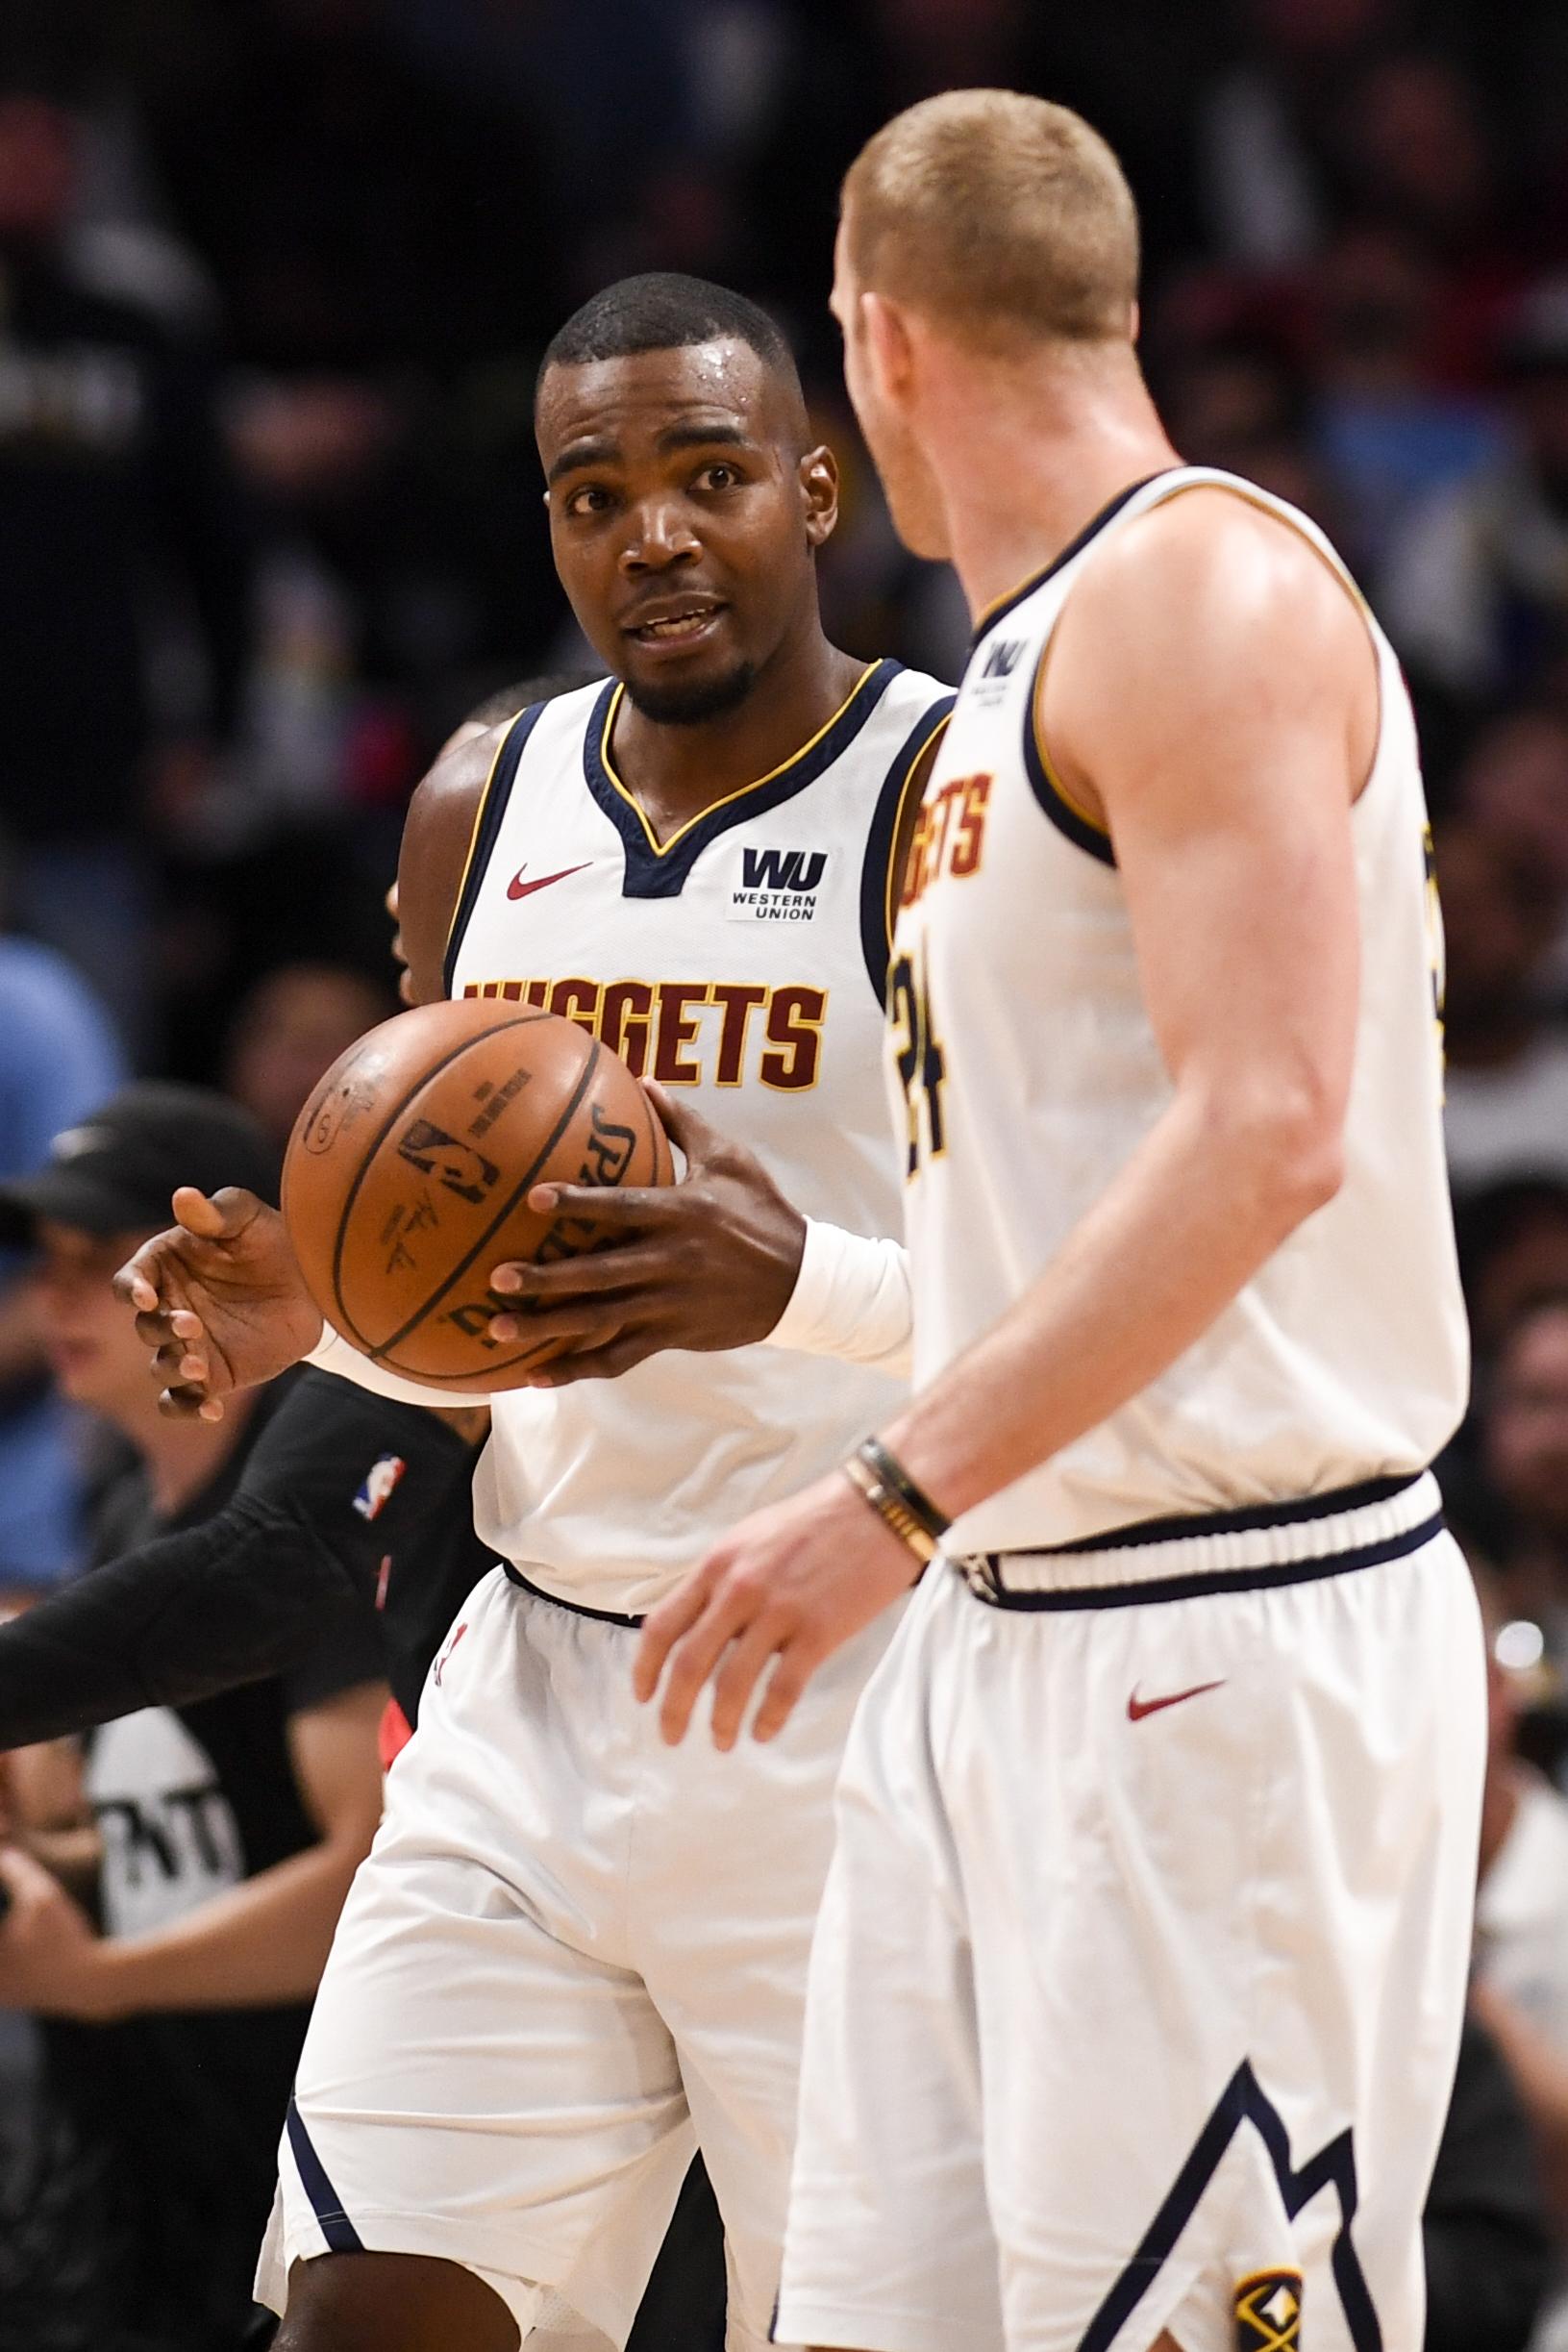 DENVER NUGGETS VS PORTLAND TRAILBLAZERS, NBA PLAYOFFS